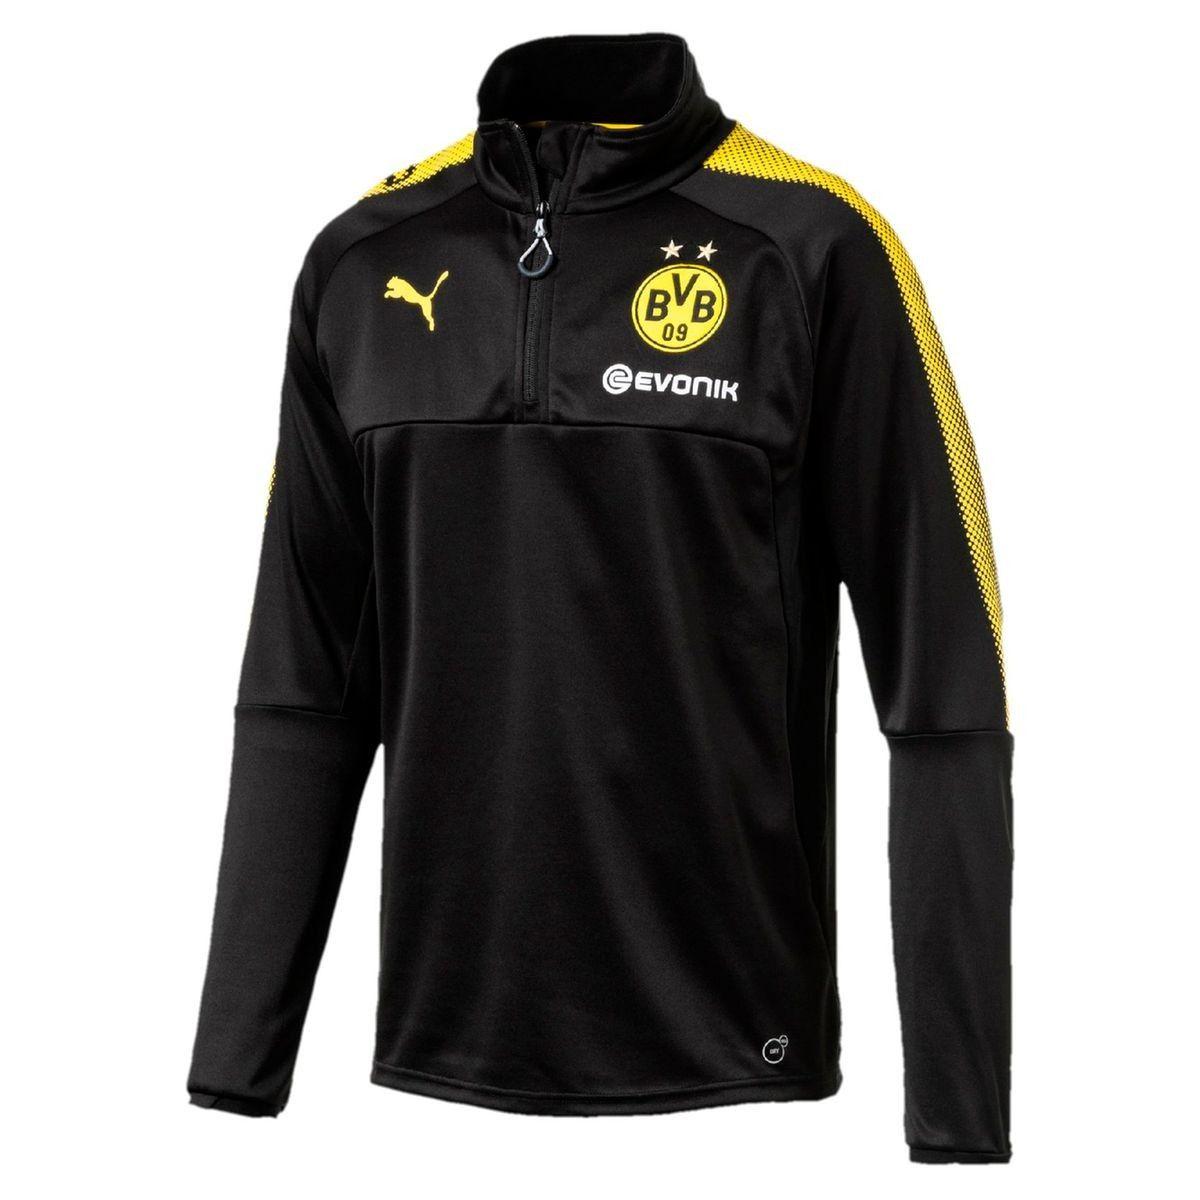 Veste Officielle Bvb Dortmund - Taille :